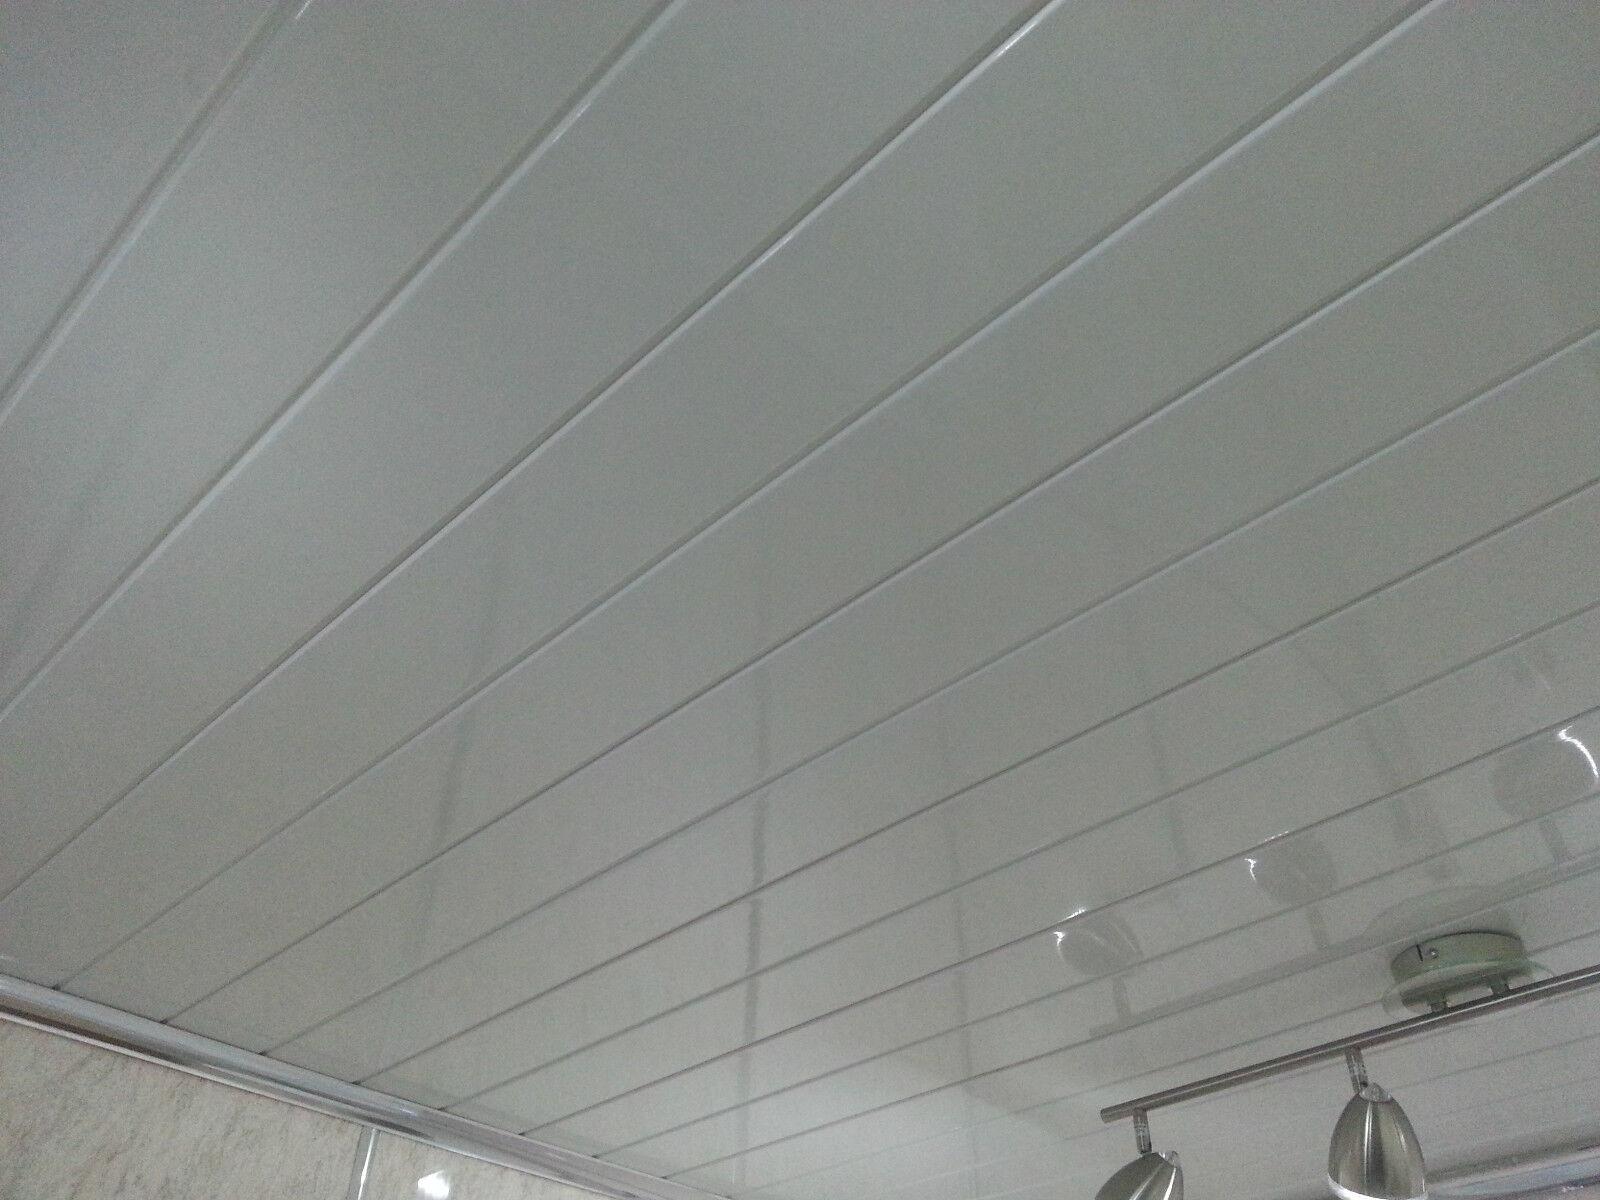 Plastic bathroom ceiling cladding - 12 X Twin White V Groove Ceiling Panels Pvc Bathroom